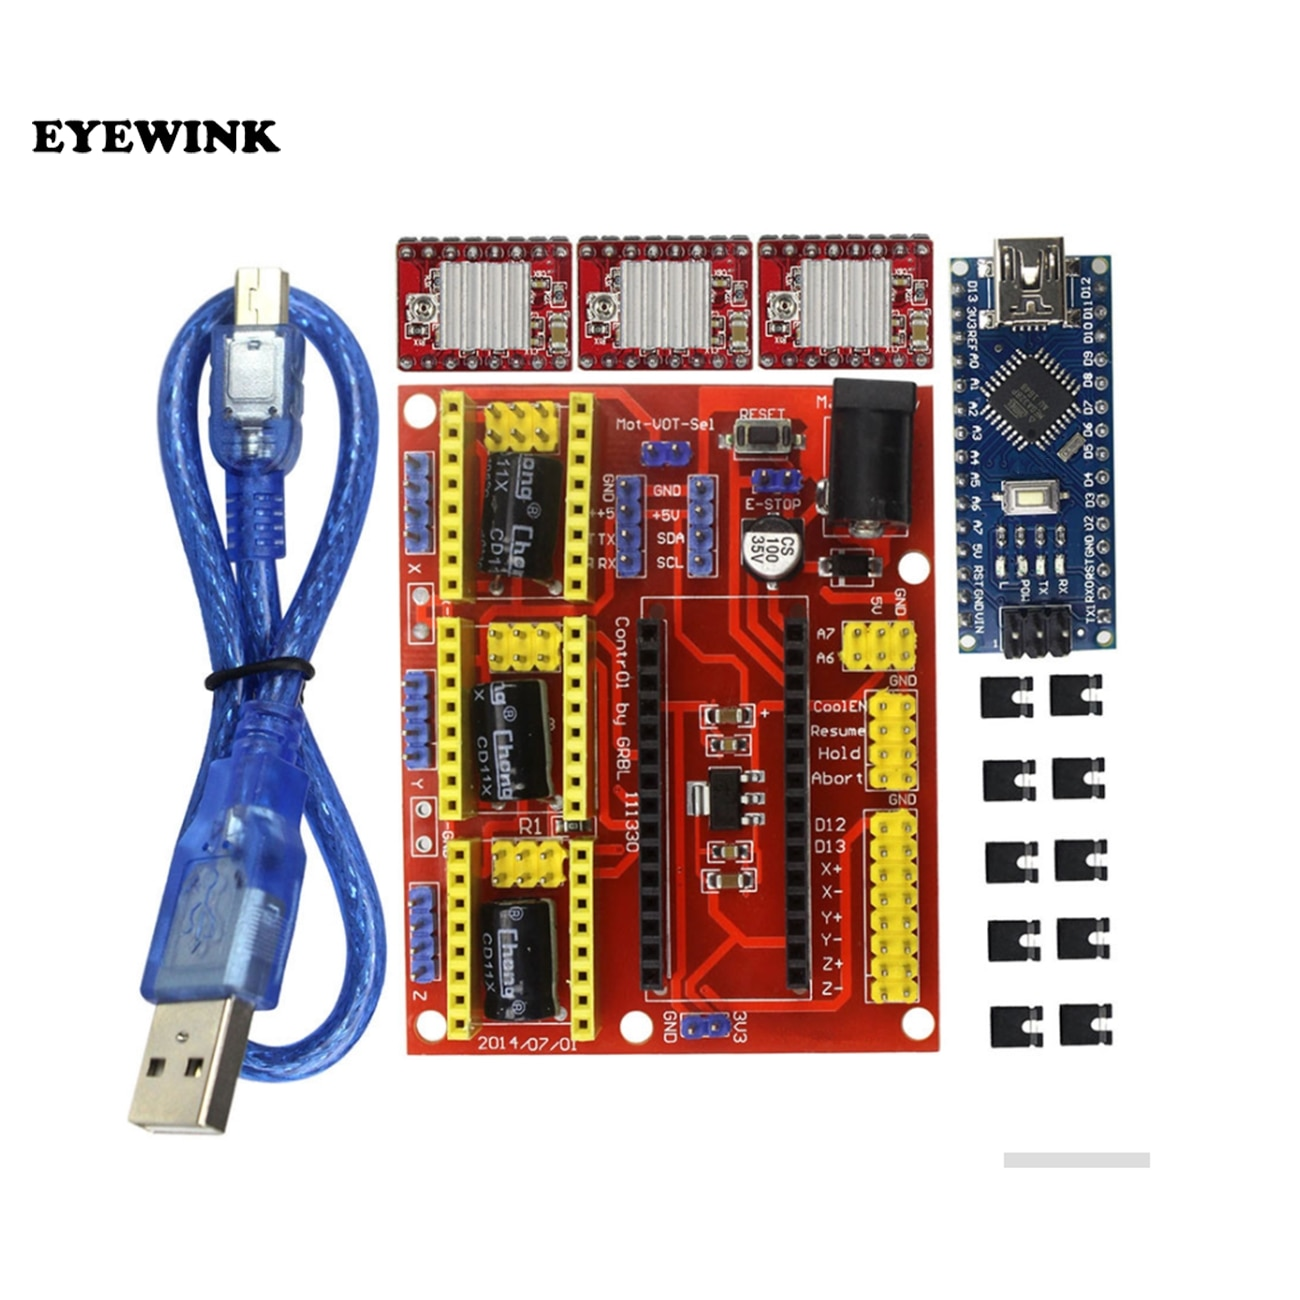 3D V4 CNC escudo V4 máquina de grabado + Nano con USB 3,0 + A4988 Reprap paso a paso los conductores para arduino Diy Kit